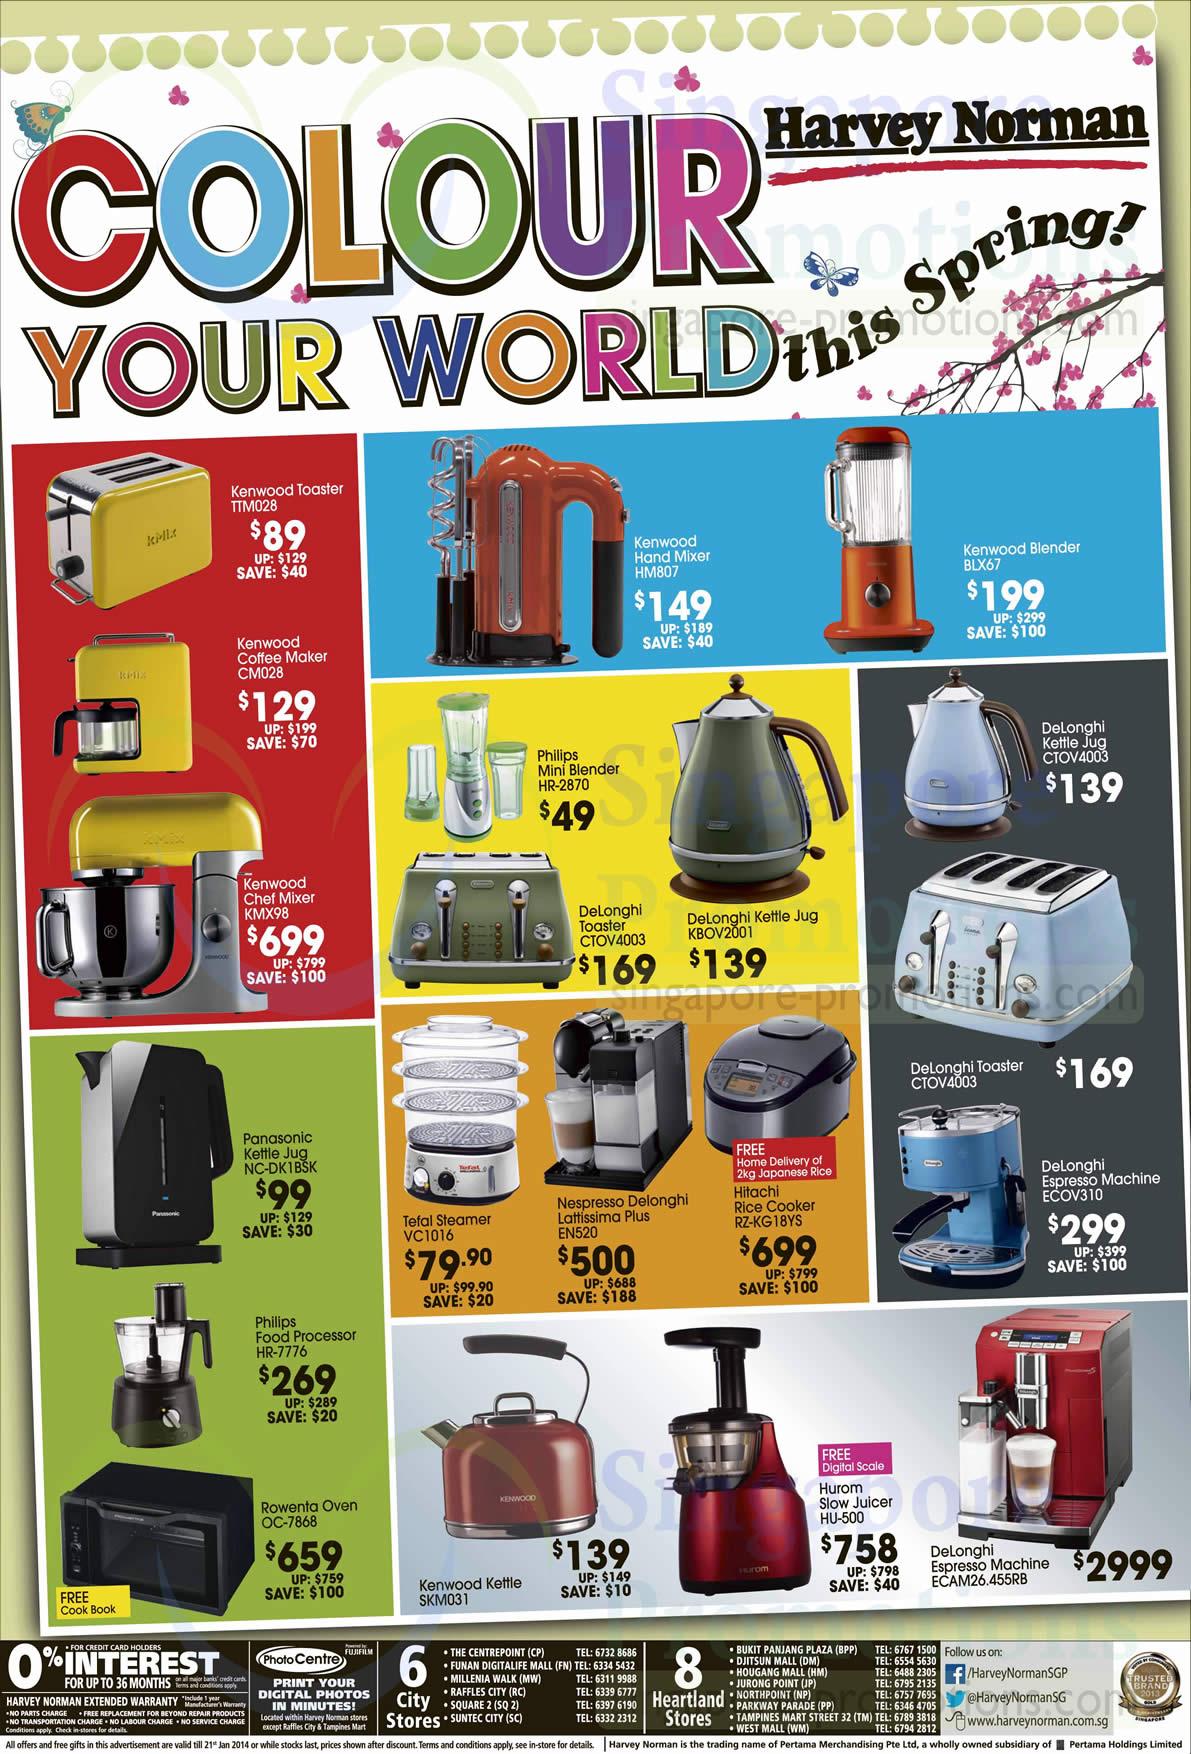 Kenwood TTM028 Toaster, Kenwood CM028 Coffee Machine, Kenwood KMX98 Chef Mixer, Kenwood HM807 Hand Mixer, Kenwood BLX67 Blender, Philips HR-2870 Blender, DeLonghi CTOV4003 Toaster, DeLonghi KBOV2001 Kettle Jug, DeLonghi CTOV4003 Kettle Jug, DeLonghi CTOV4003 Toaster, Panasonic NC-DK1BSK Kettle Jug, Tefal VC1016 Steamer, Nespresso EN520 Coffee Machine, Hitachi RZ-KG18YS Rice Cooker, DeLonghi ECOV310 Coffee Machine, Philips HR-7776 Food Processor, Rowenta OC-7868 Oven, Kenwood SKM031 Kettle, Hurom HU-500 Slow Juicer and DeLonghi ECAM26.455RB Coffee Machine